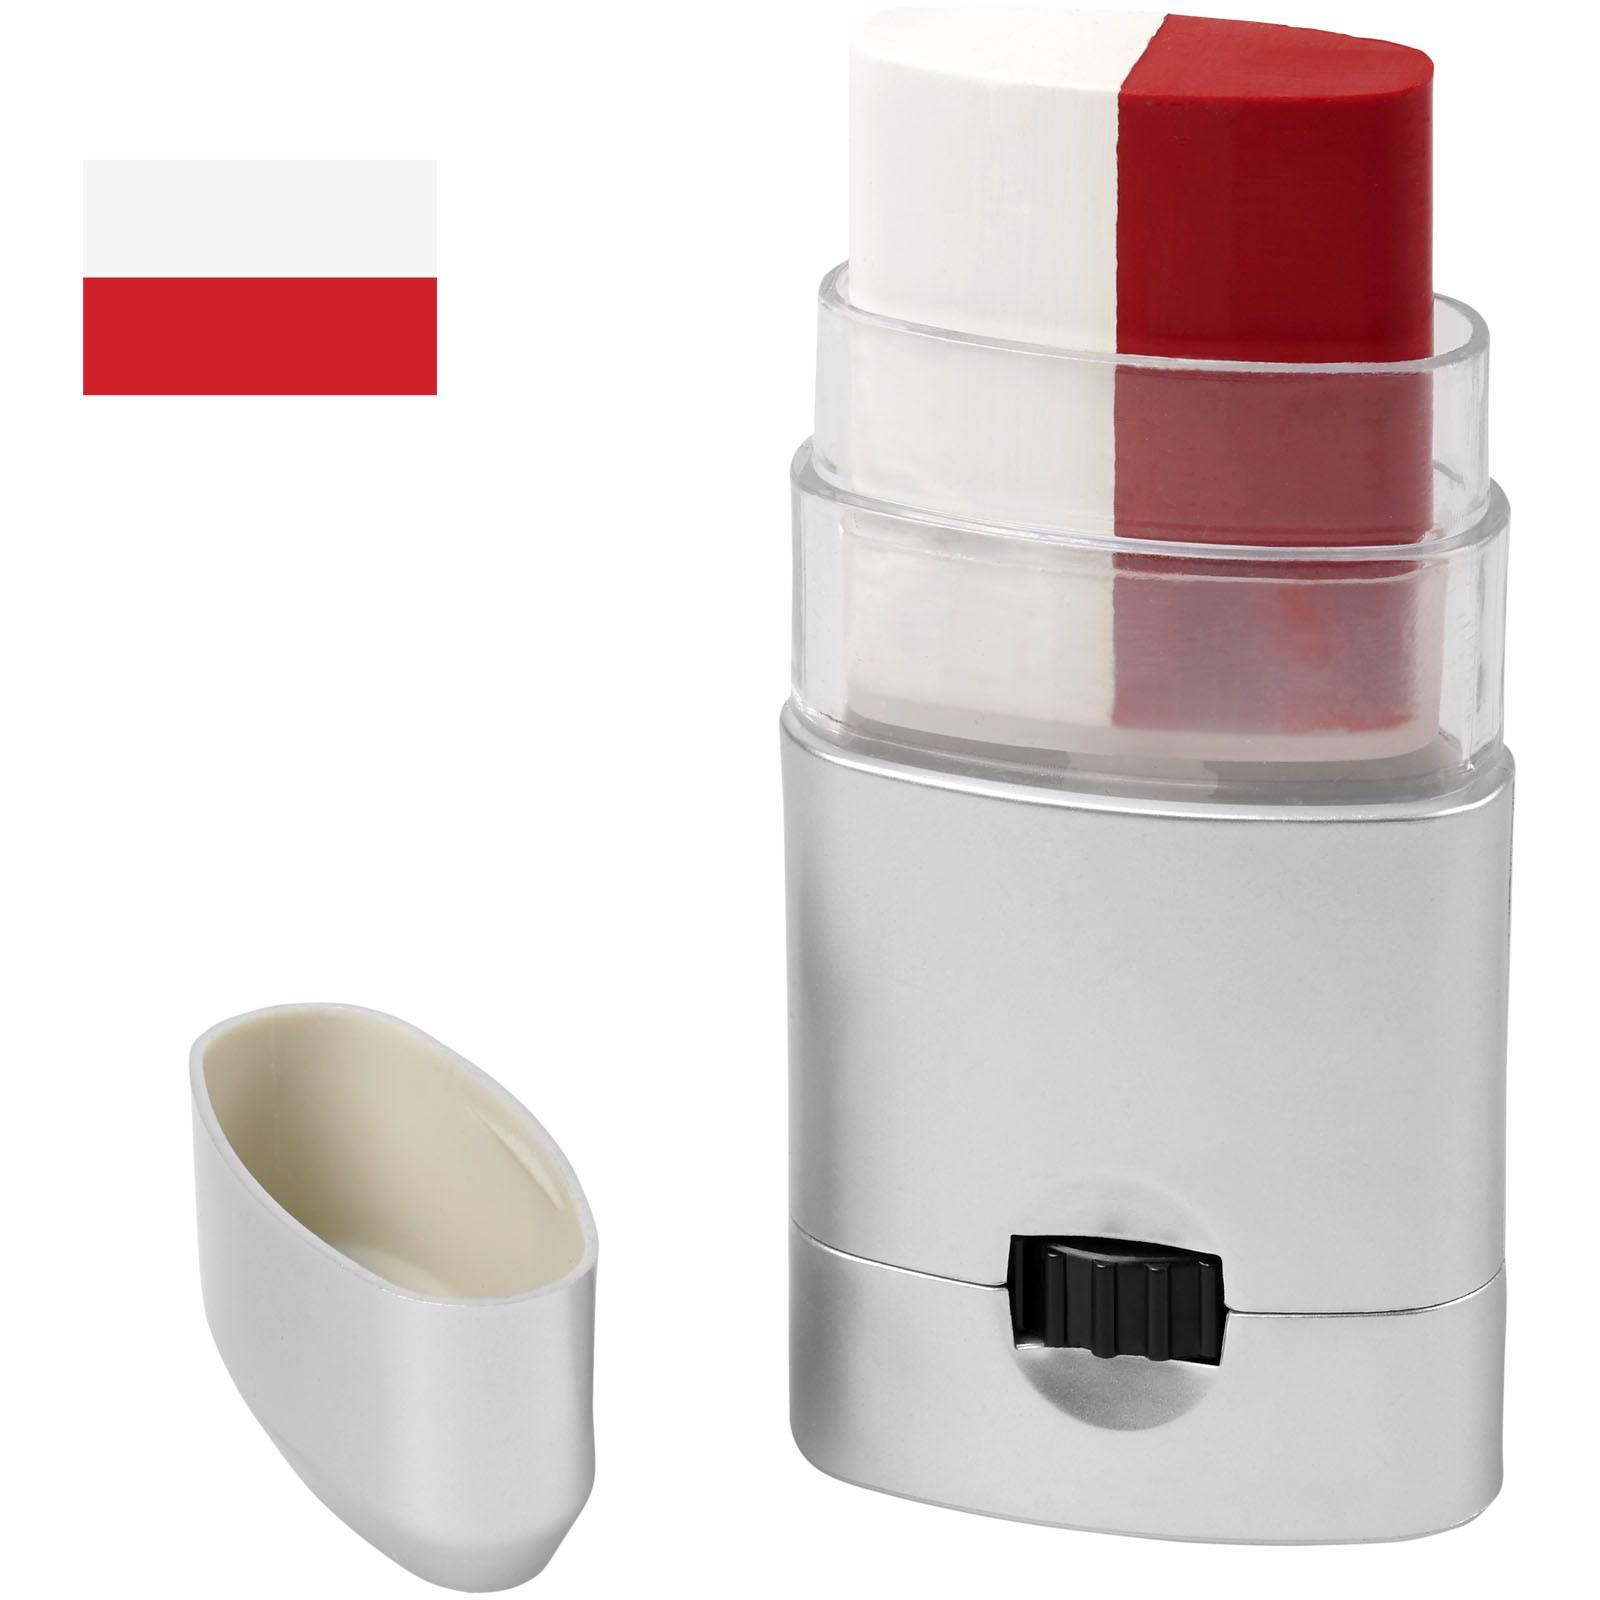 Velox Körperfarbe - Weiss / Rot